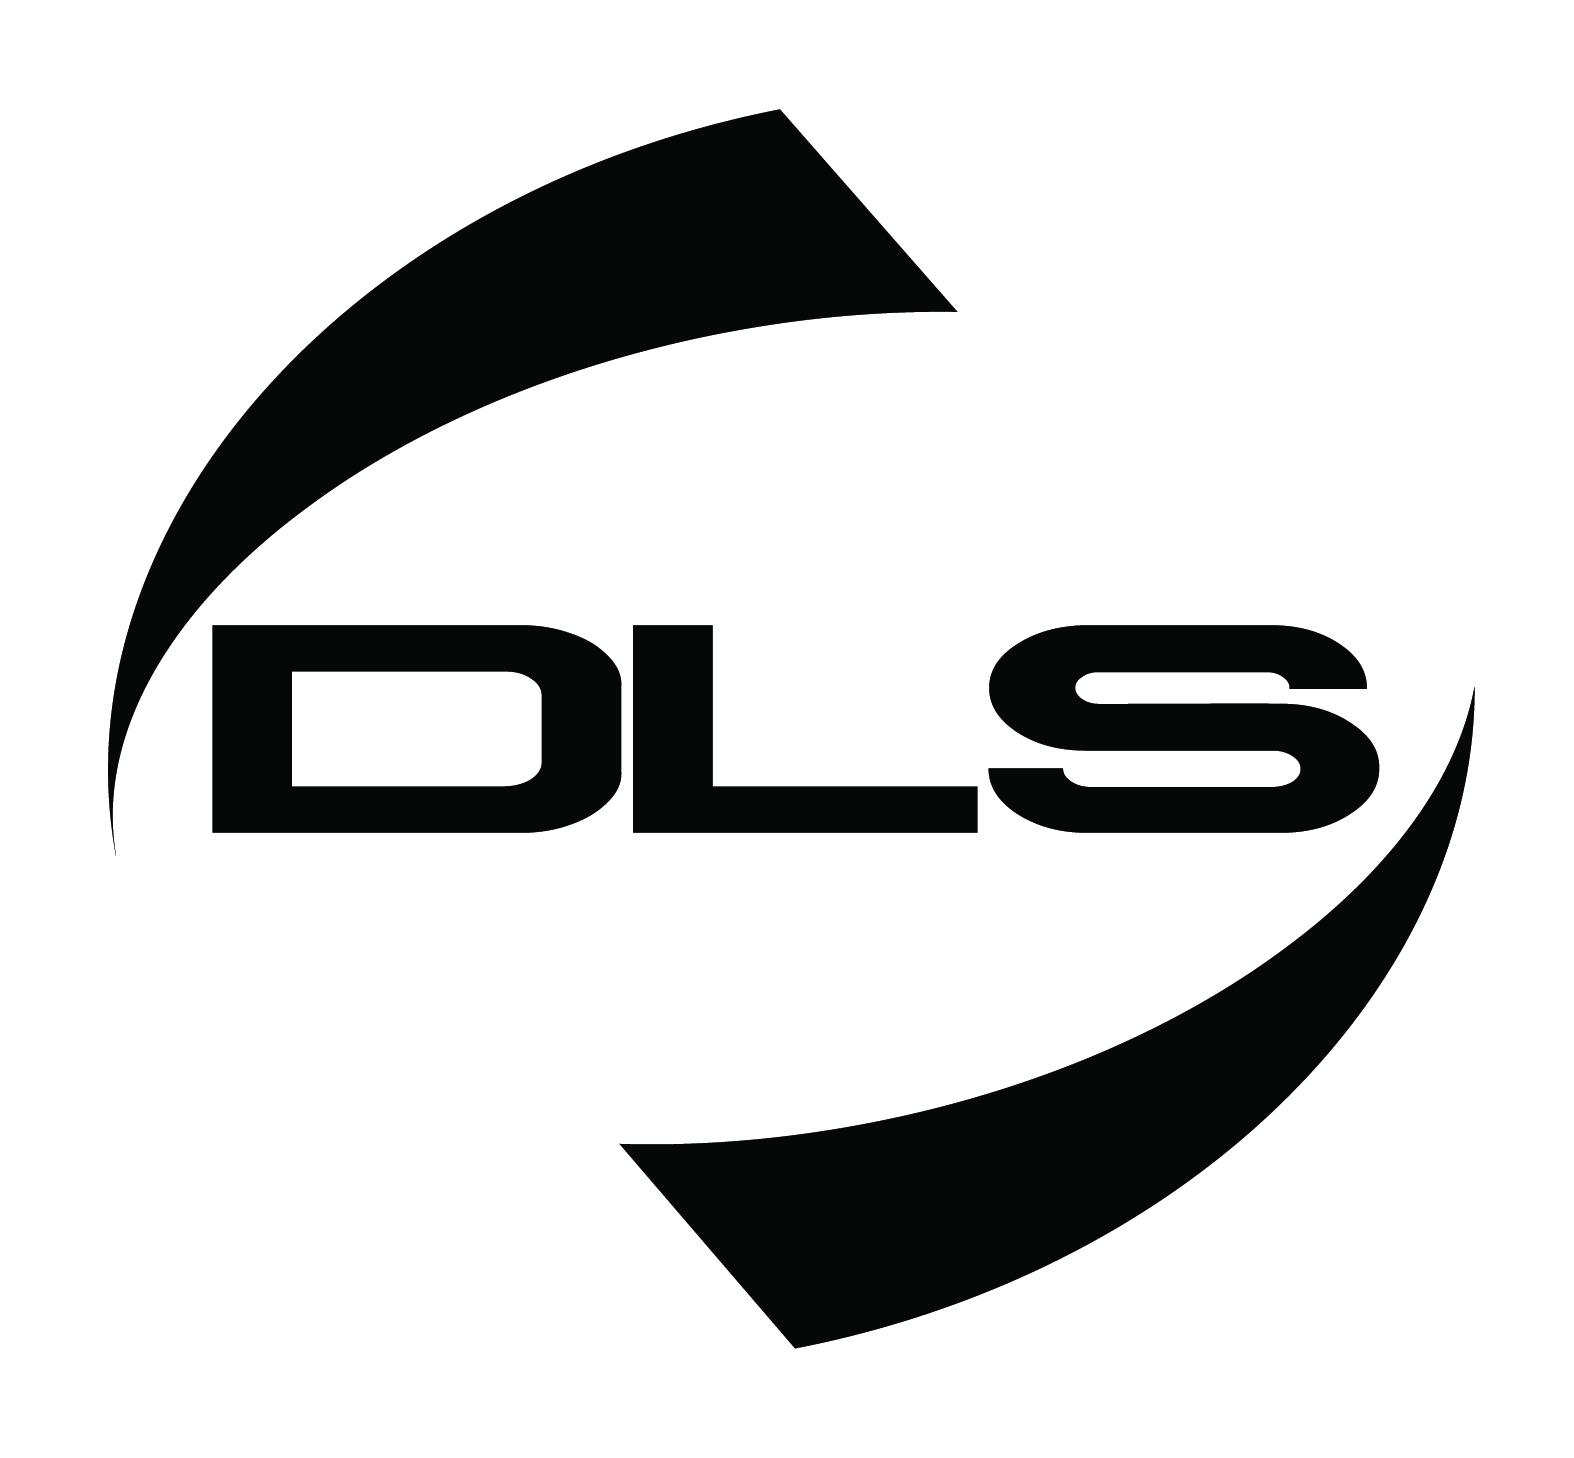 dls_black_plain.jpg